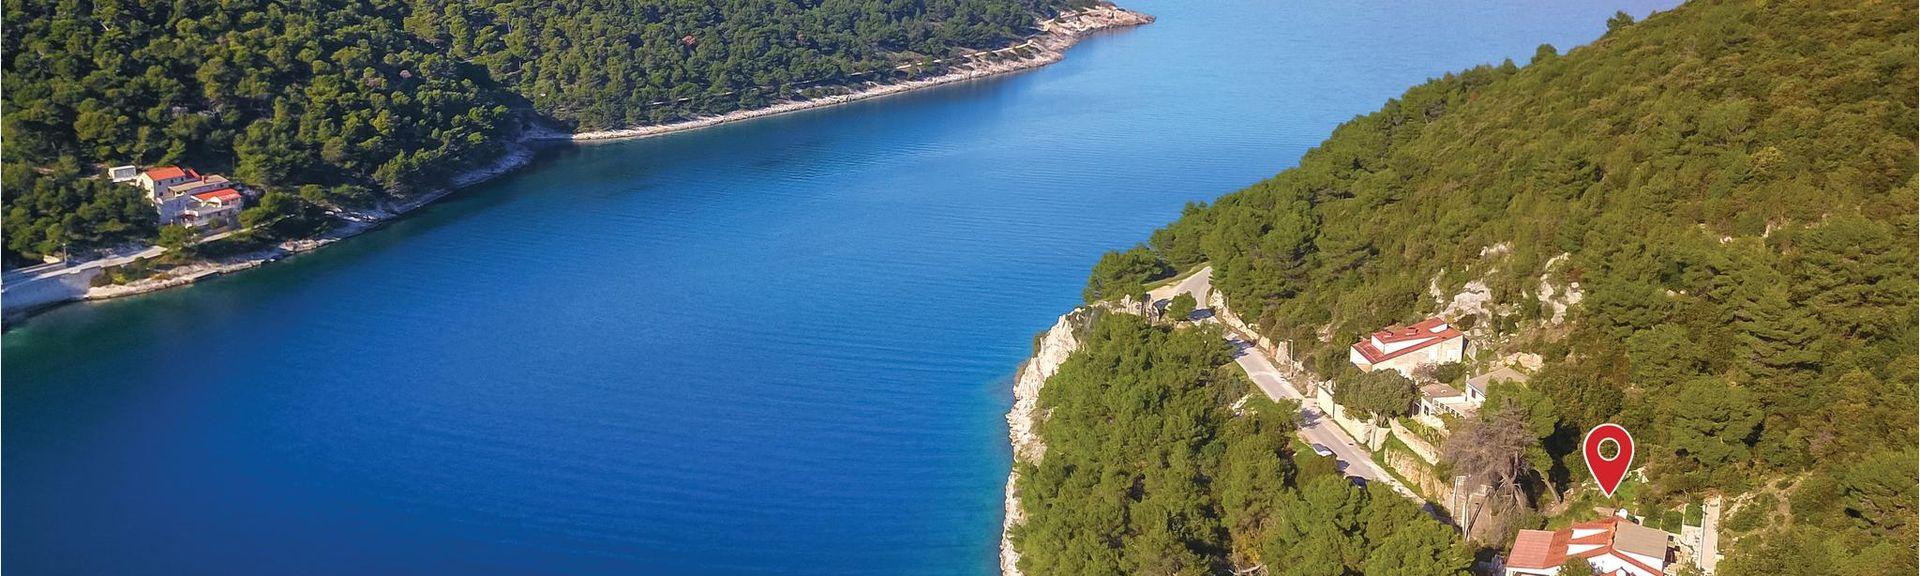 Nerežišća, Općina Nerežišća, Split-Dalmatia County, Croatia